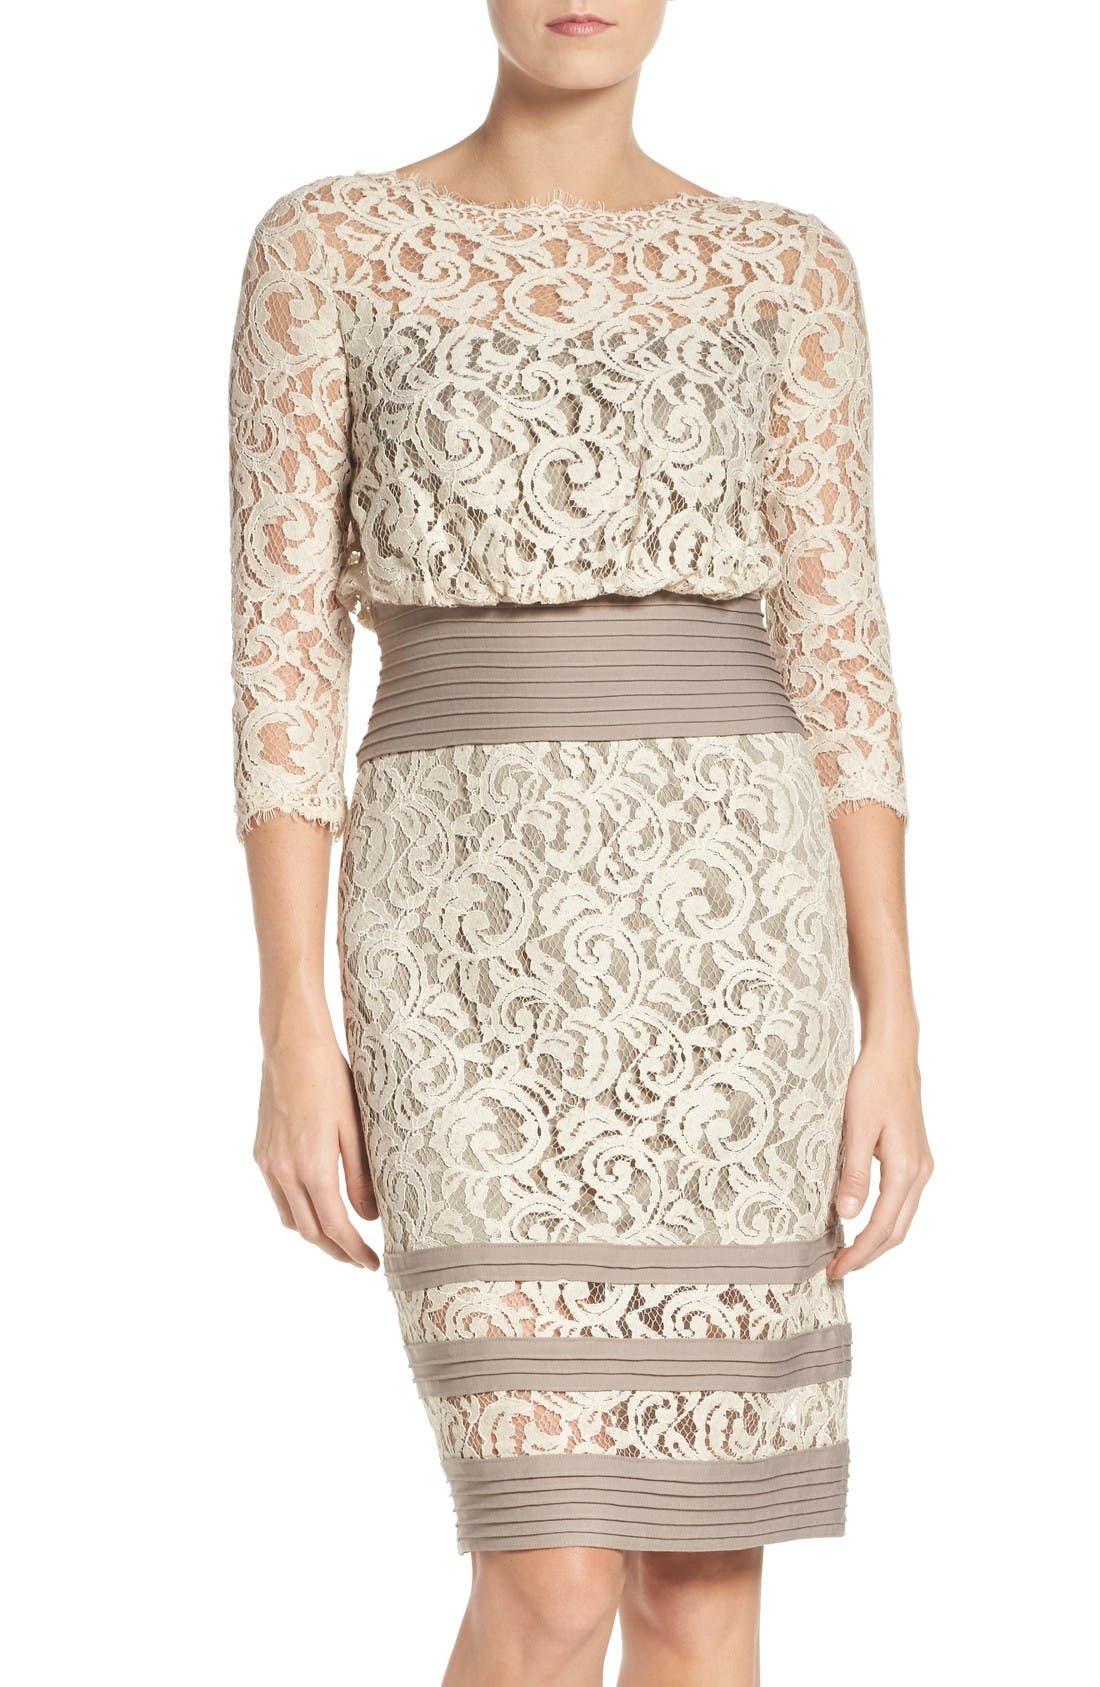 Alternate Image 1 Selected - Tadashi Shoji Pleat Waist Lace Blouson Dress